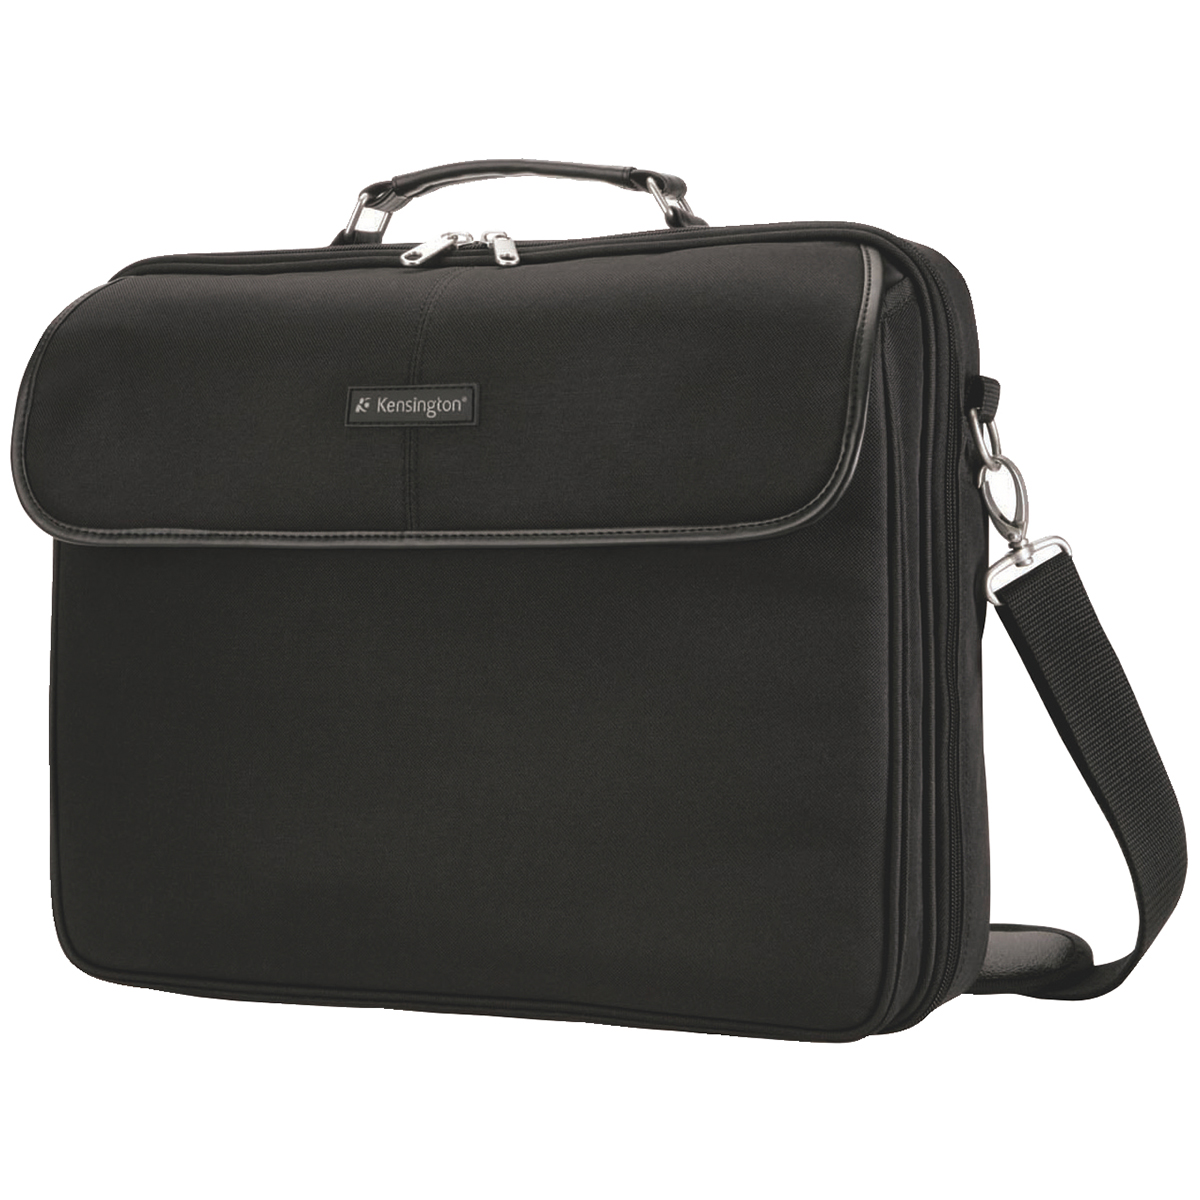 Kensington K62560EU Simply Portable SP30 15.6 Inch Clamshell Laptop Case